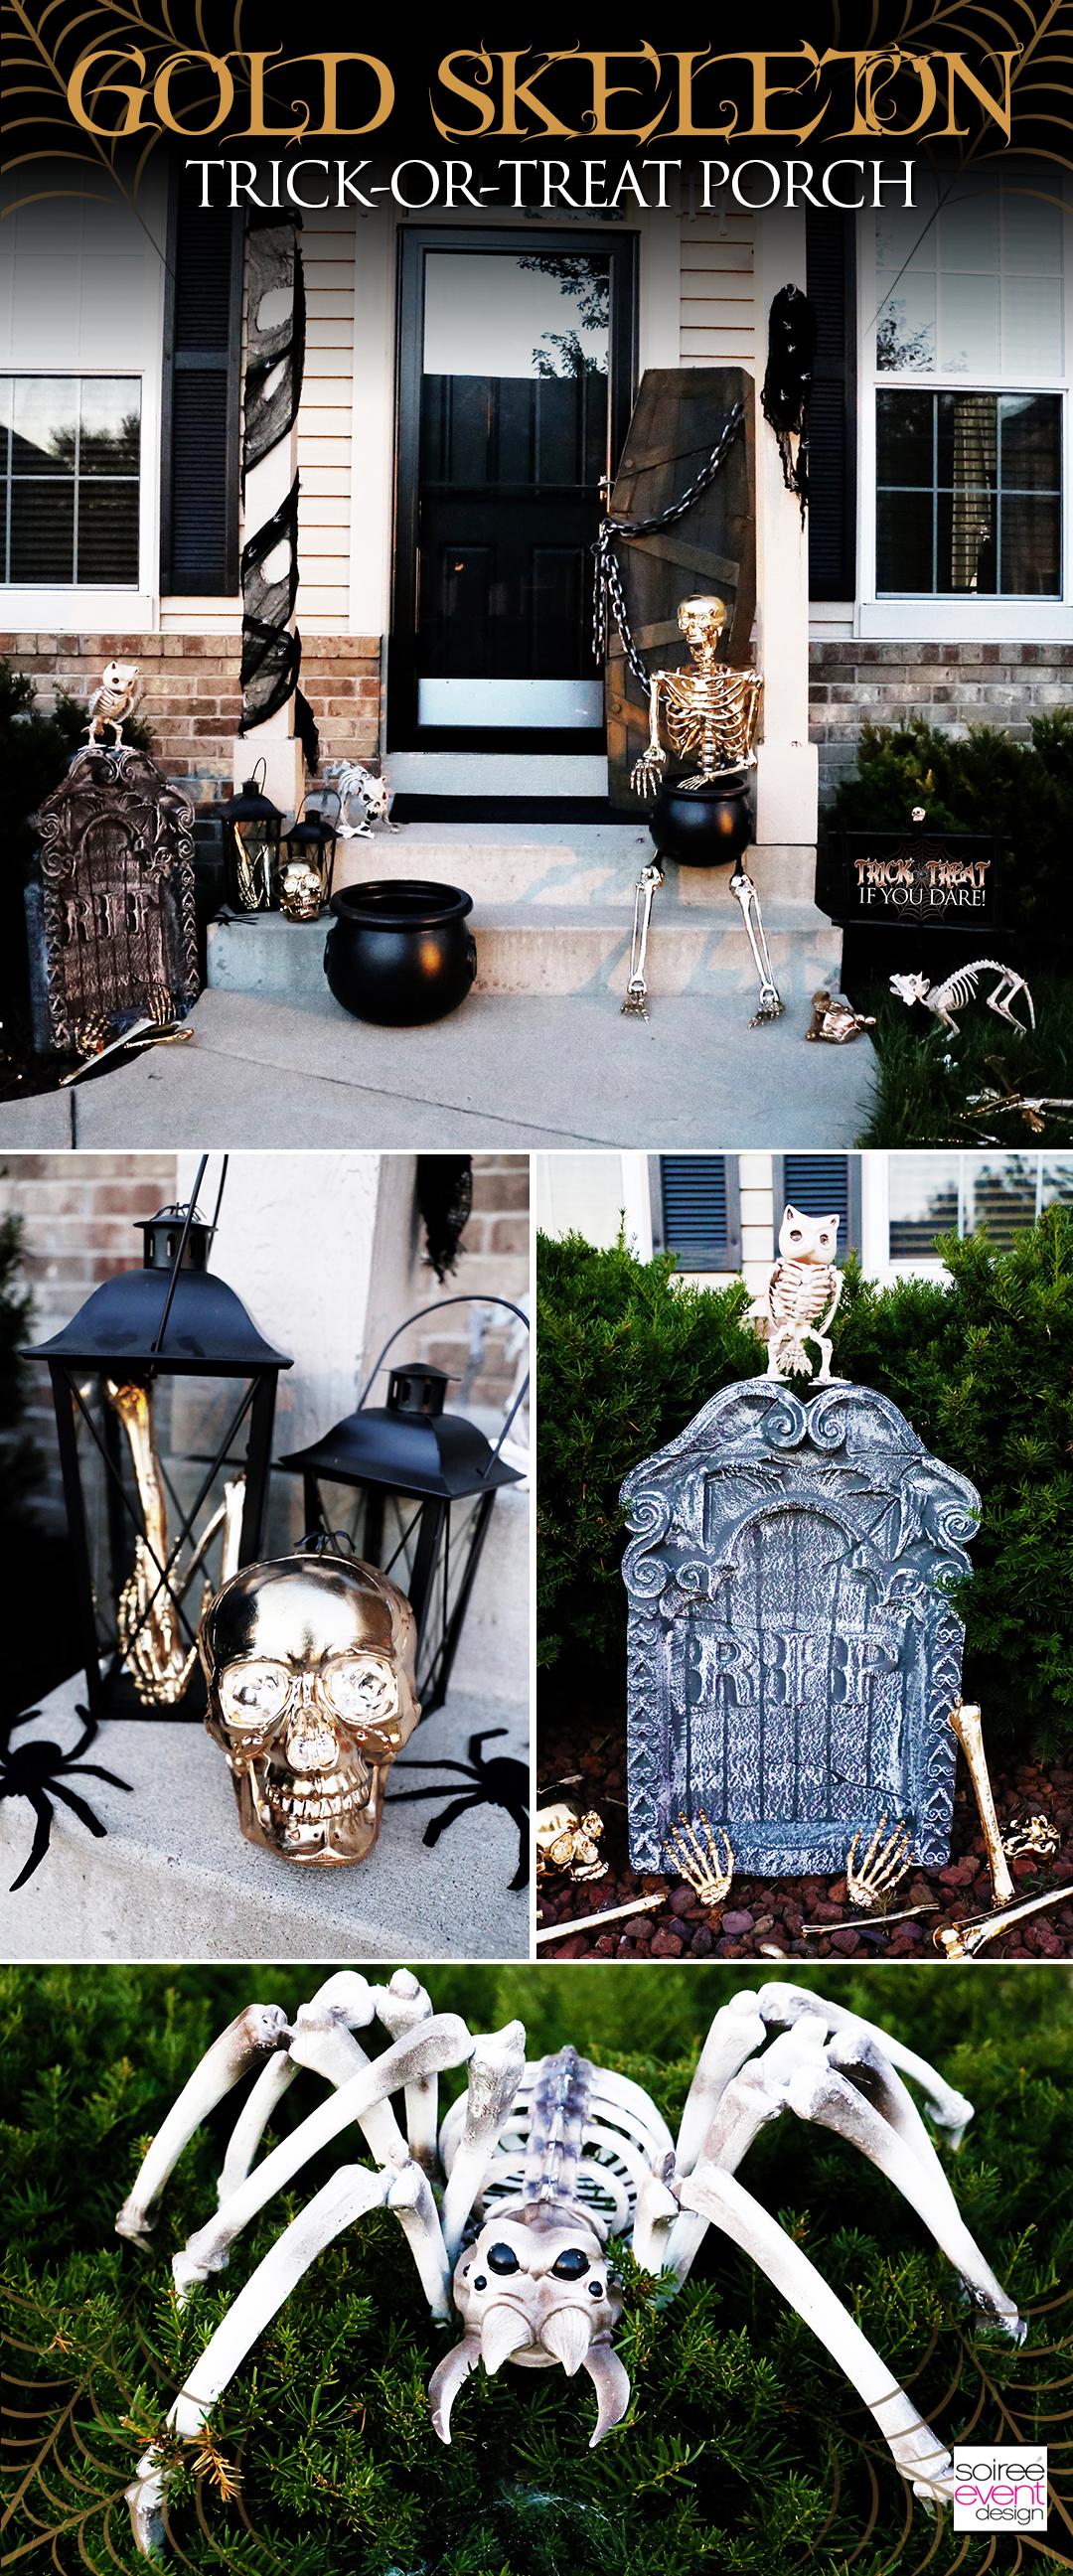 Gold Skeleton Bones Halloween Trick-or-Treat Porch